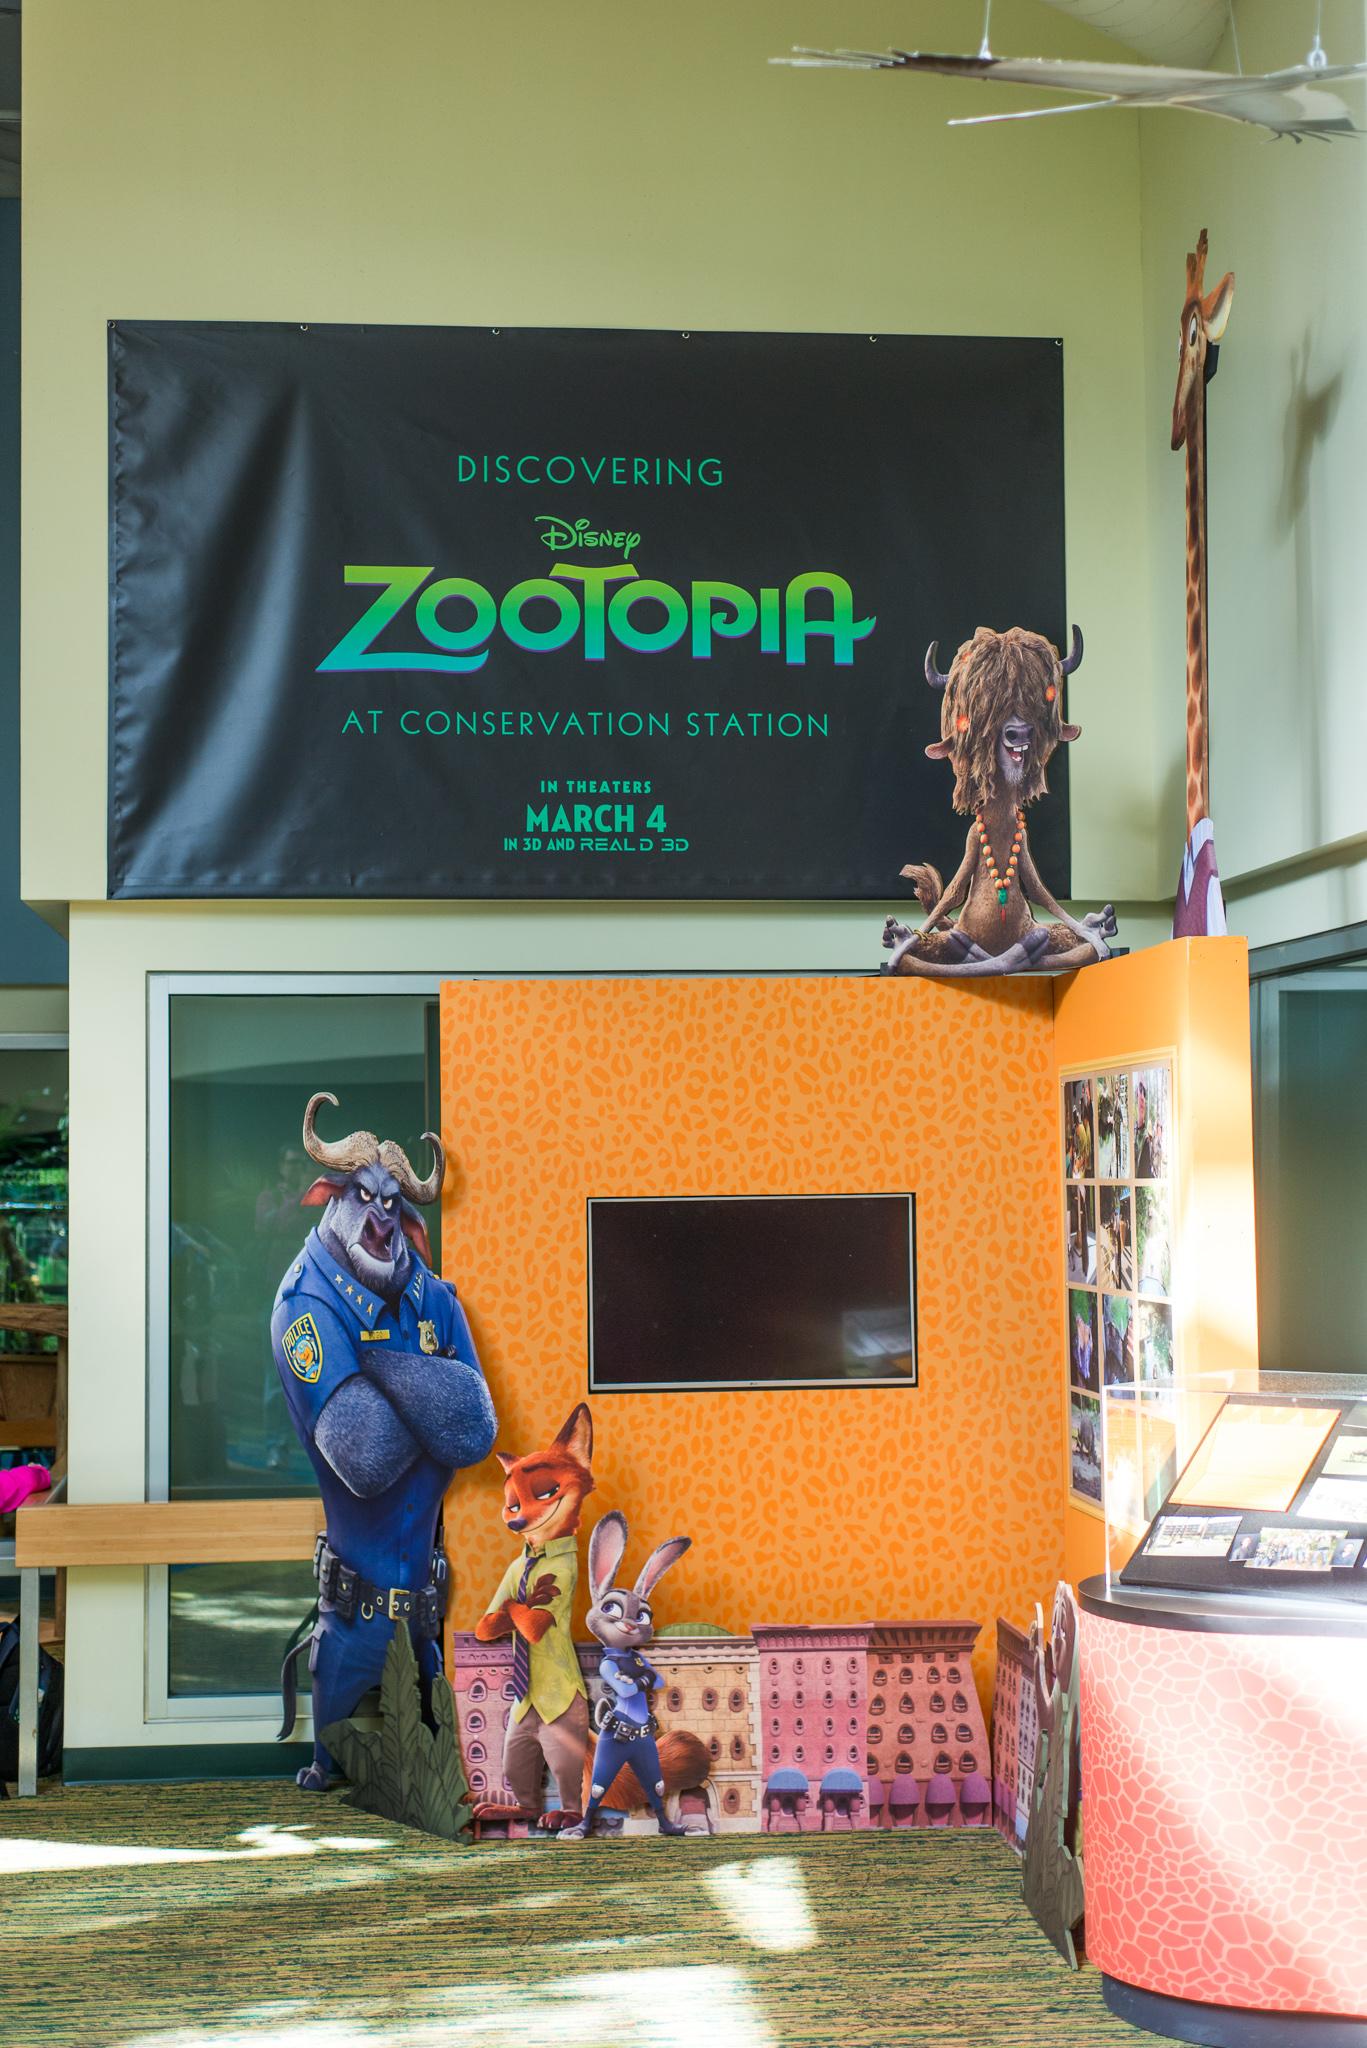 Zootpia Exhibit at Disney's Animal Kingdom